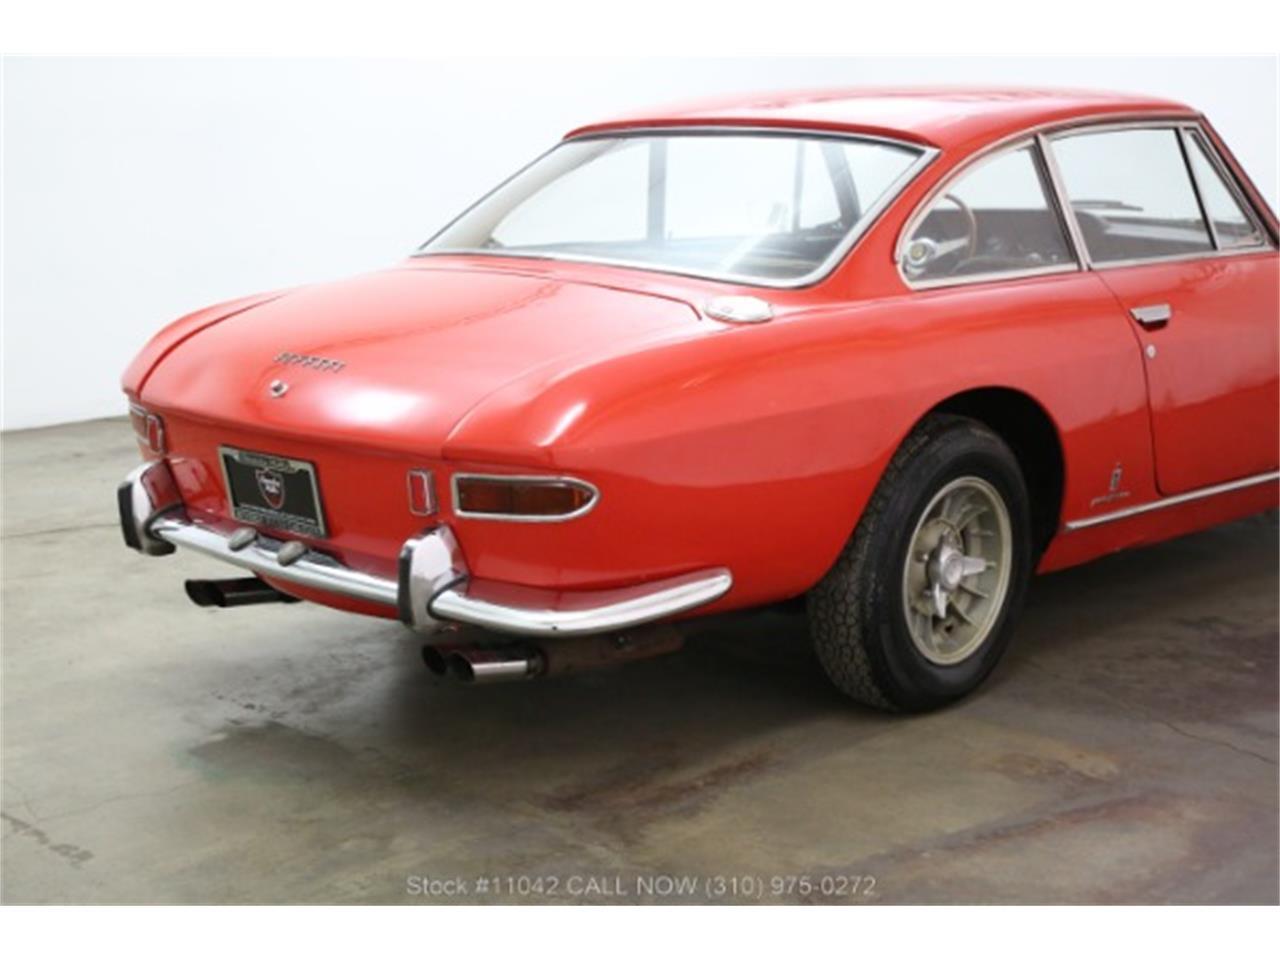 Large Picture of '66 Ferrari 330 GT located in California - $154,500.00 - R3V2